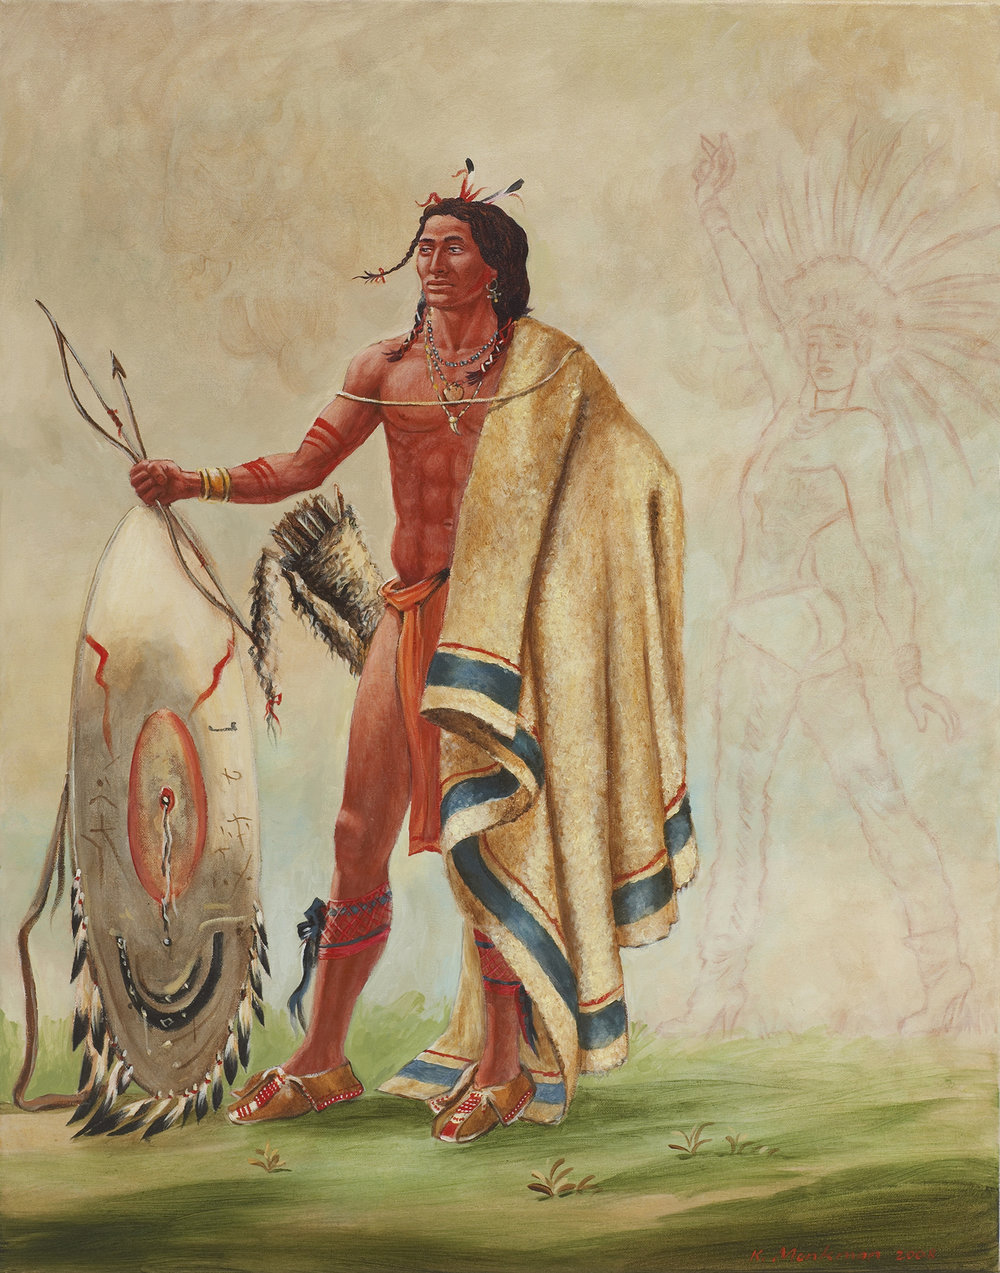 Kotz-A-Tó-Ah (Smoked Shield, A Distinguished Warrior) with Faint Heart 38,757